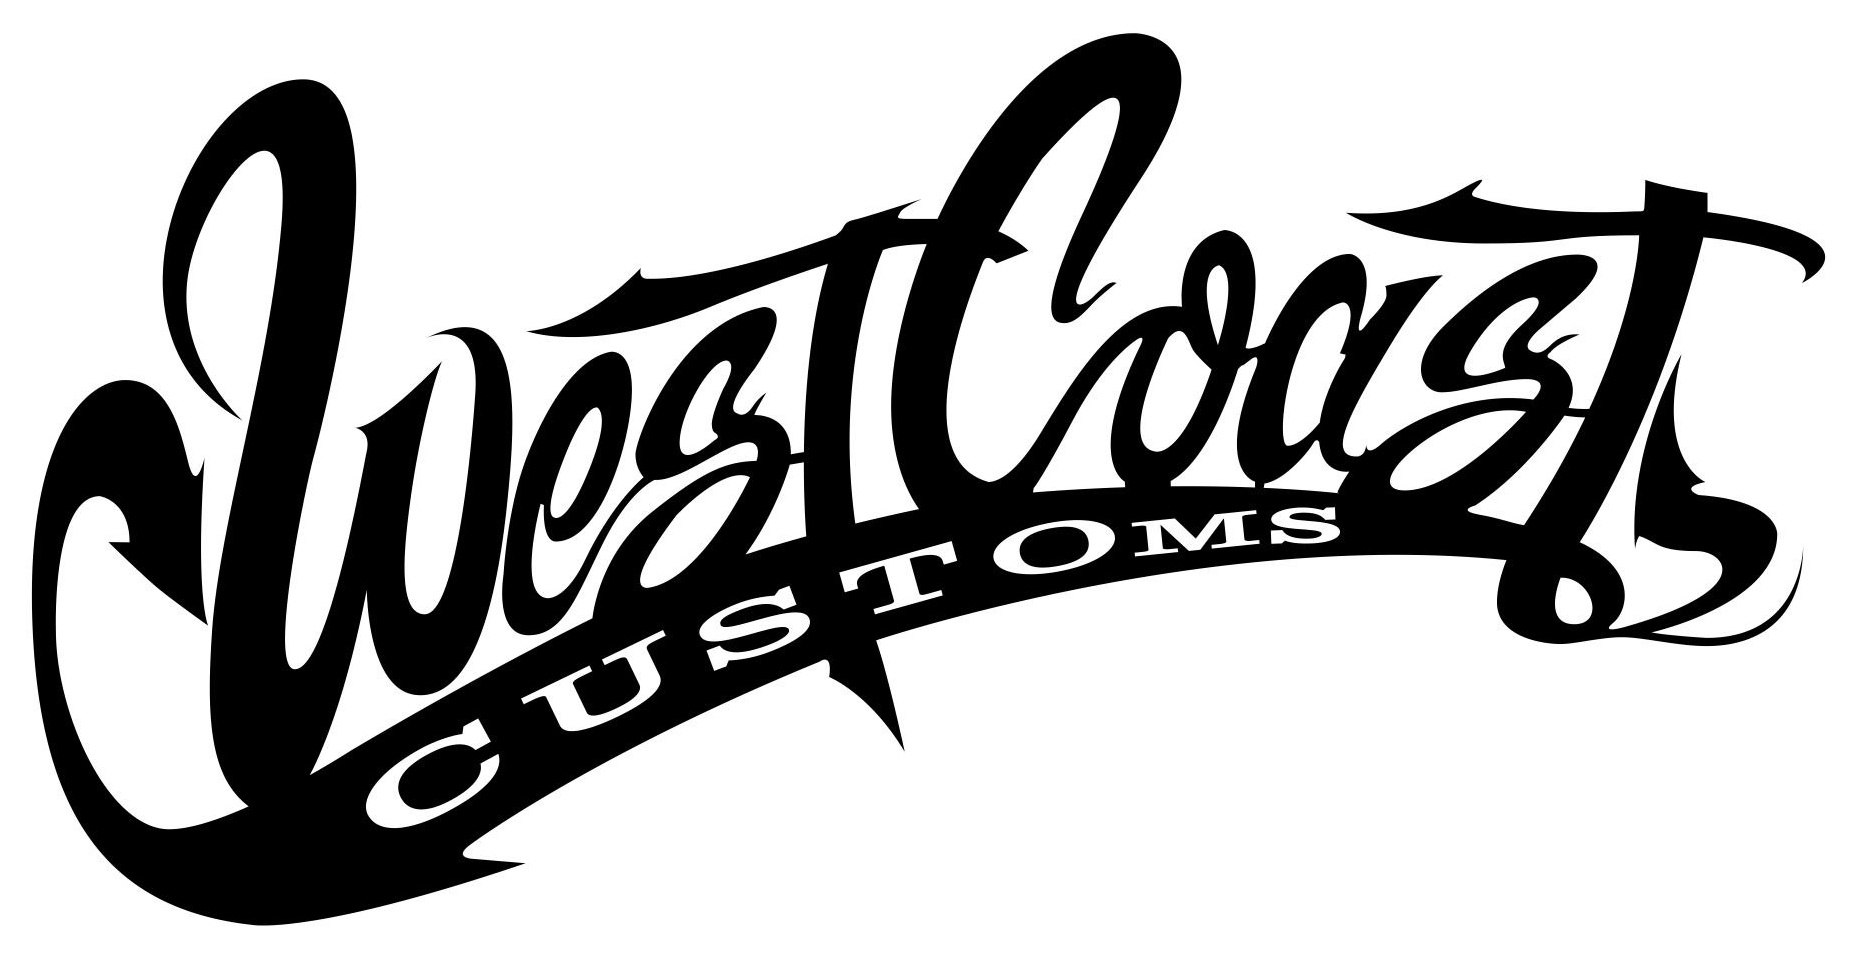 West Coast Customs Logo Vector CDR File